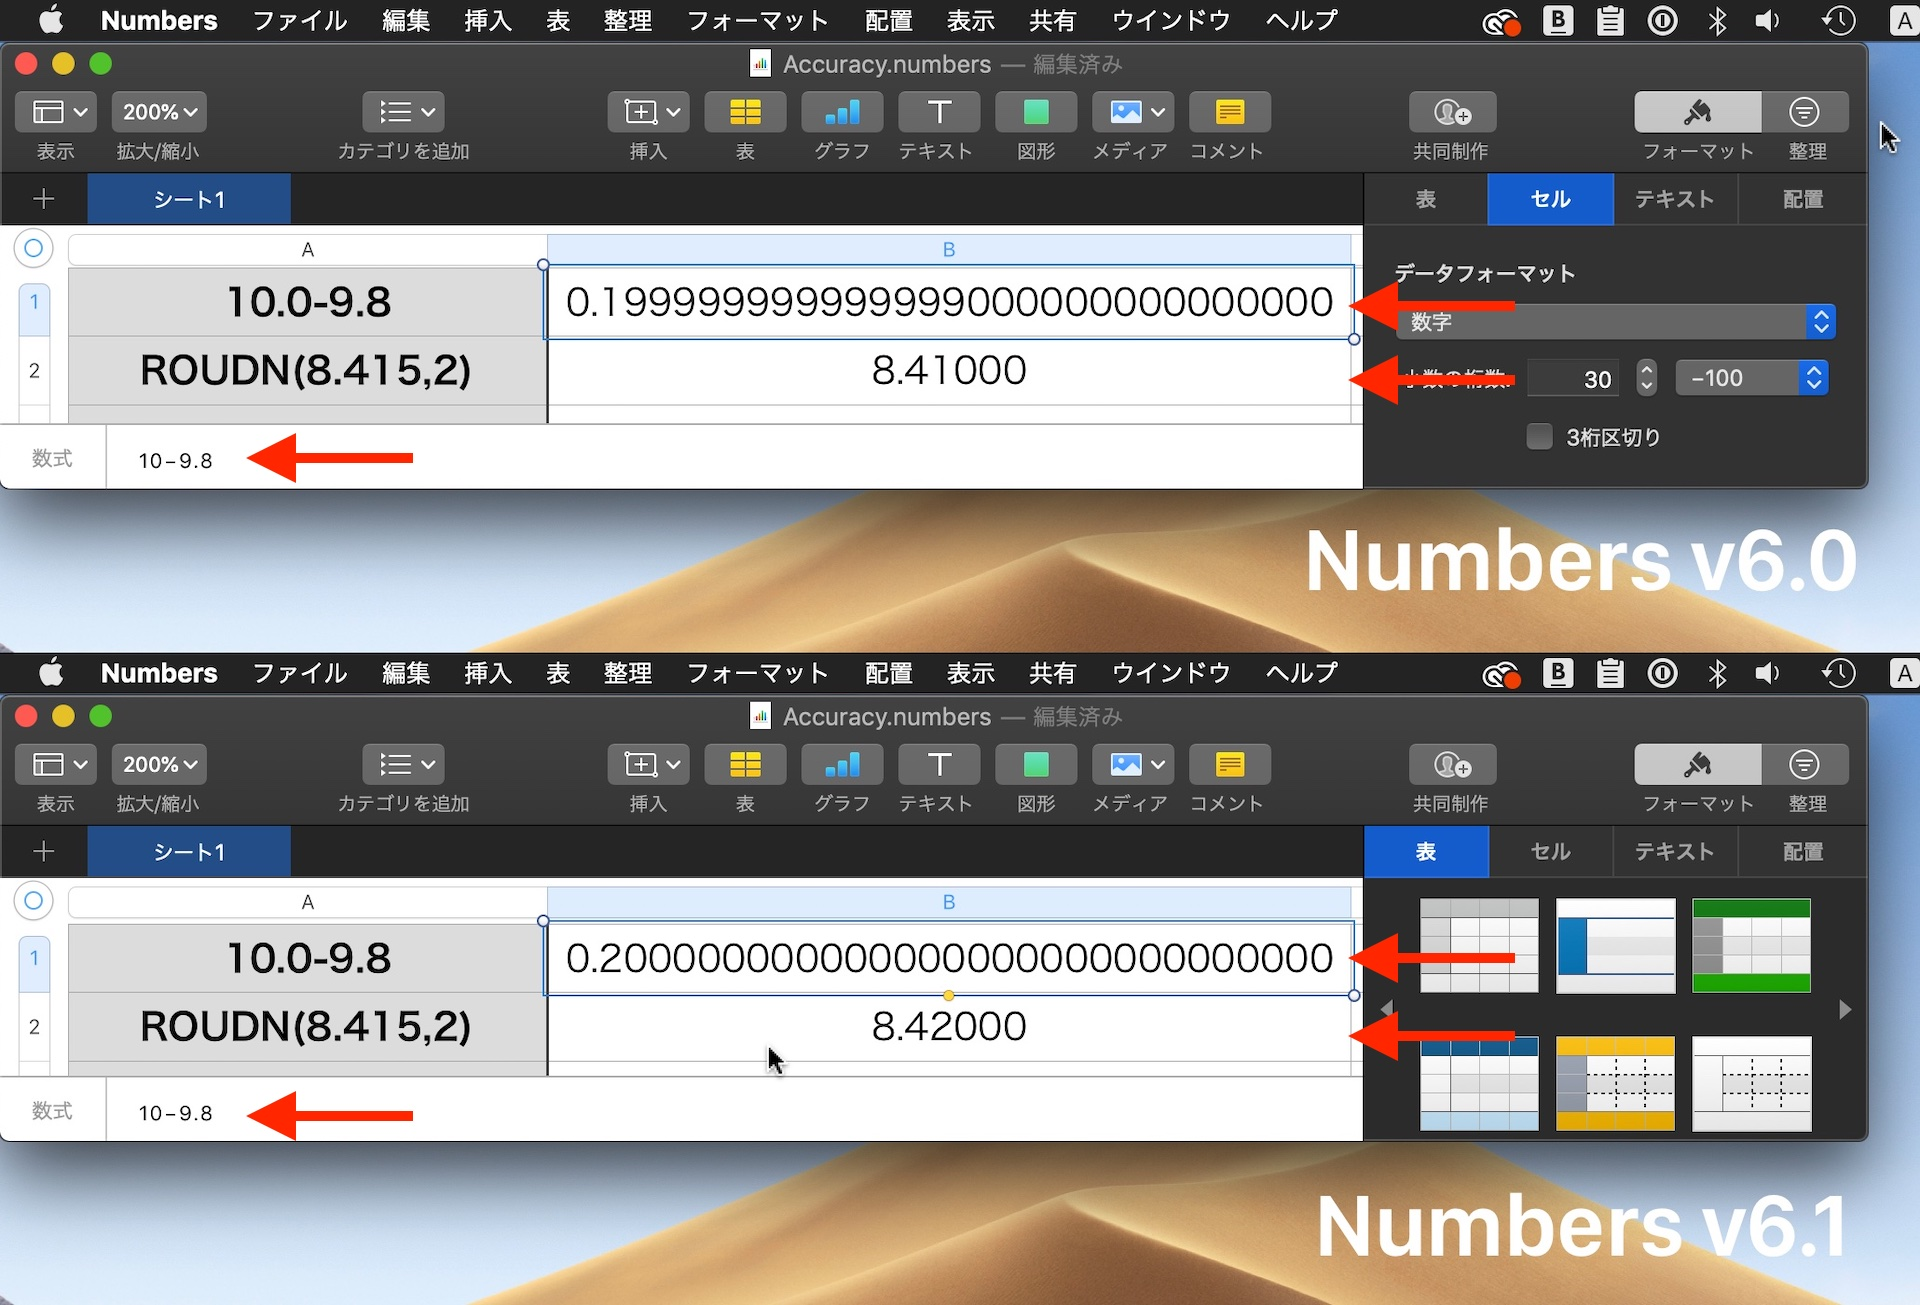 128-bit Decimal Floating Point (DFP) encoding